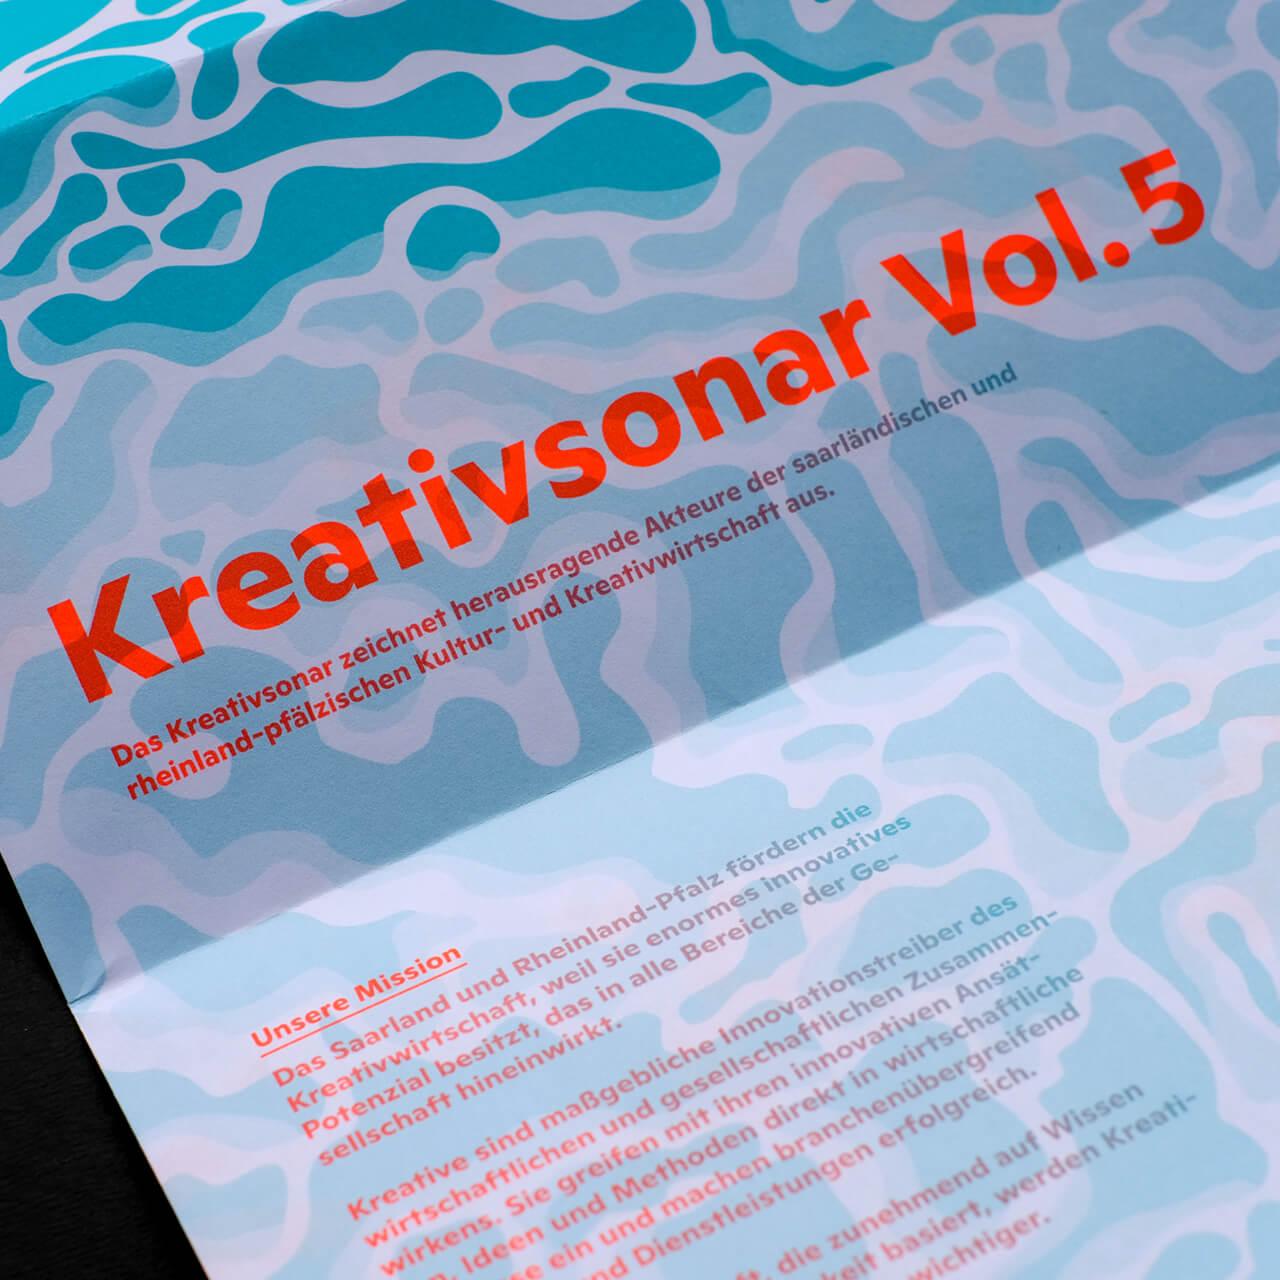 Kreativsonar_2020_03